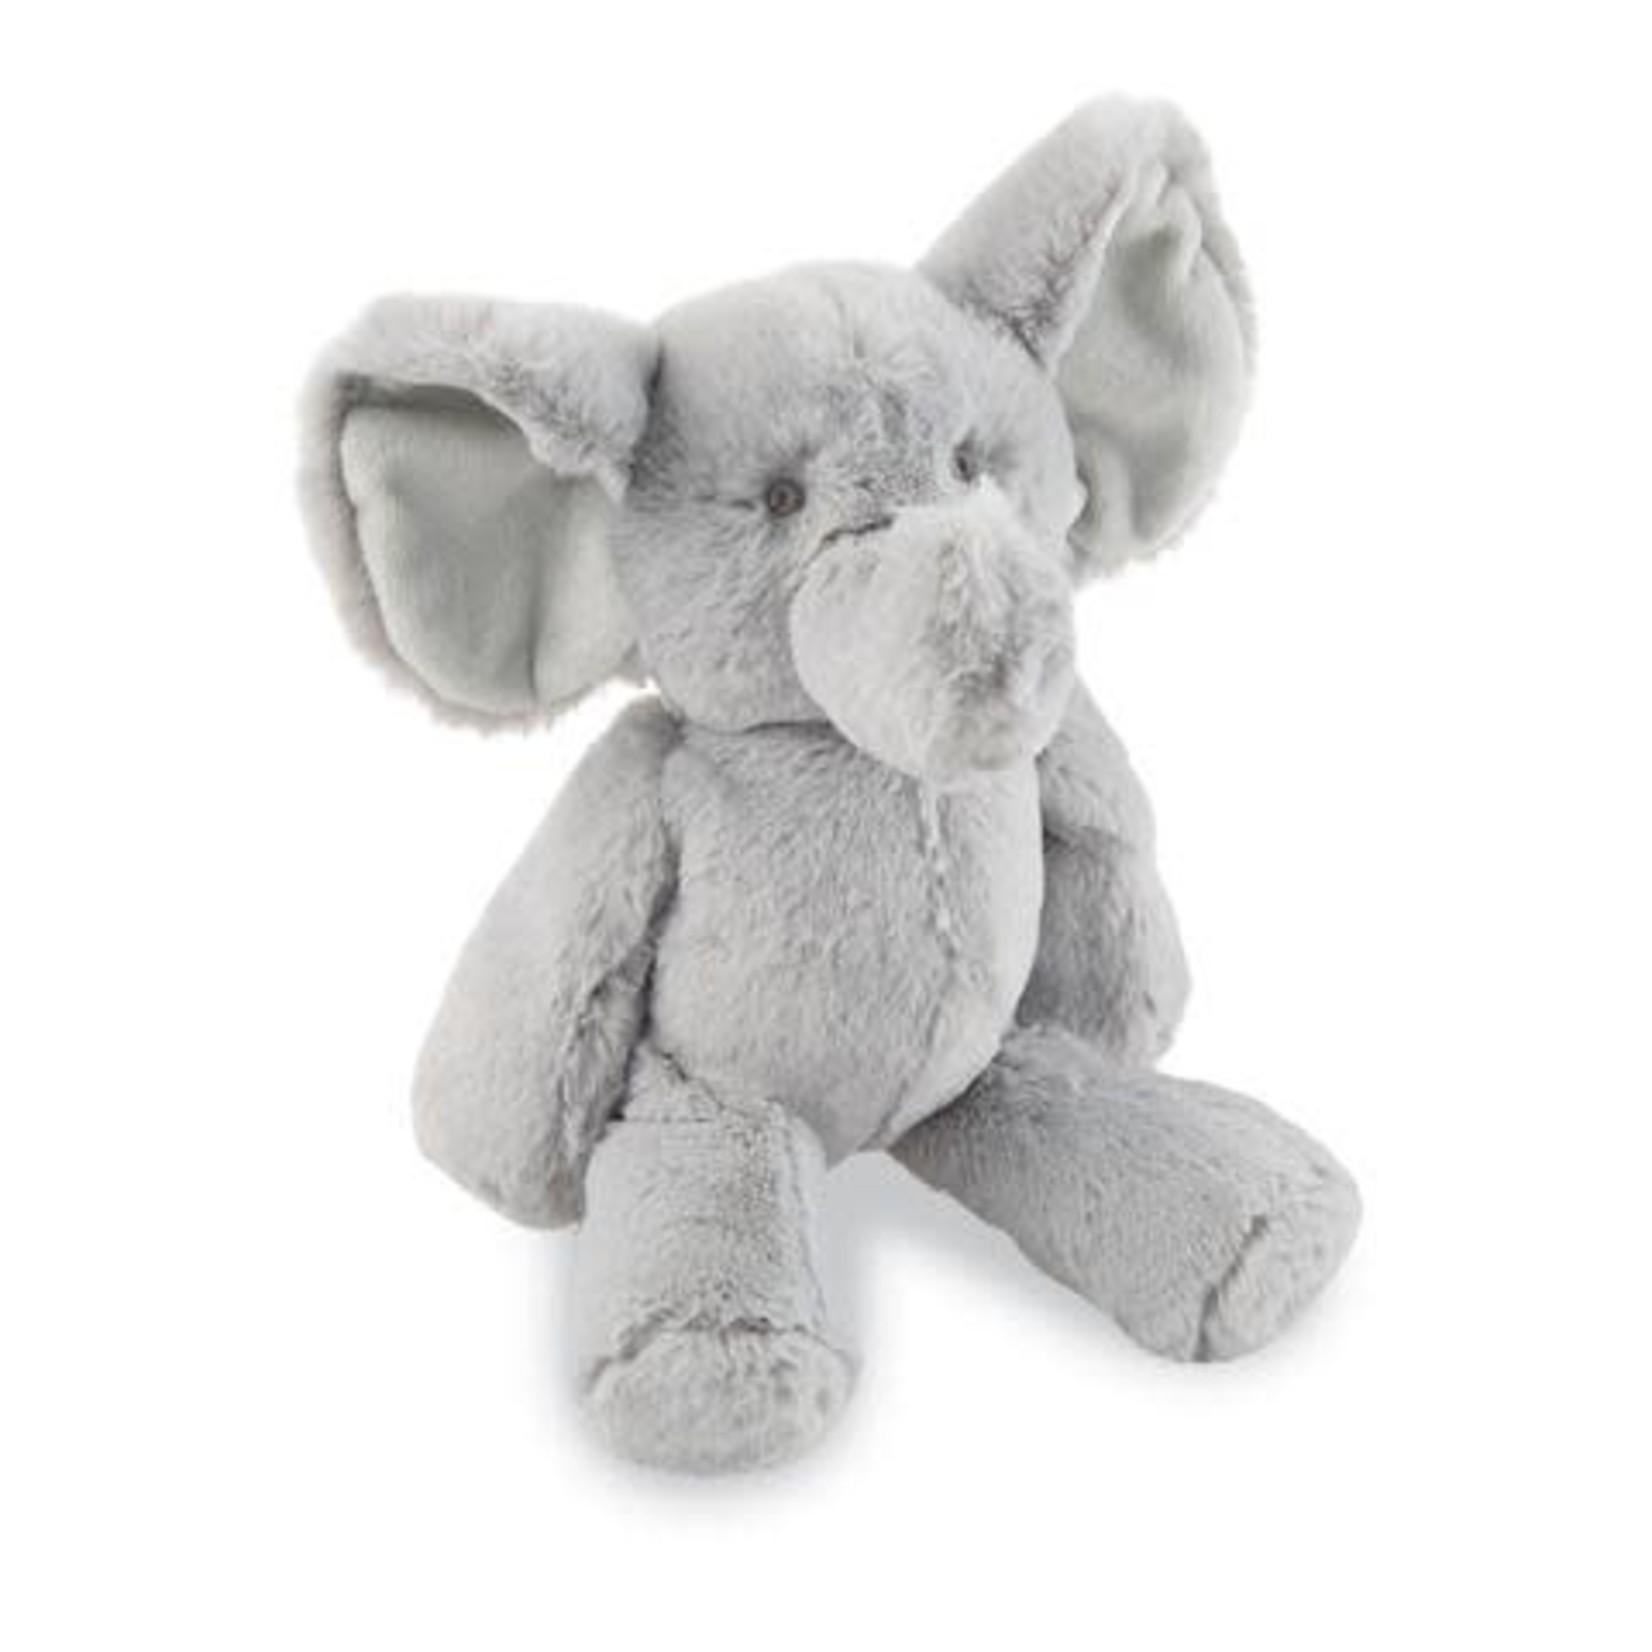 MudPie ELEPHANT PLUSH PAL GIFT SET